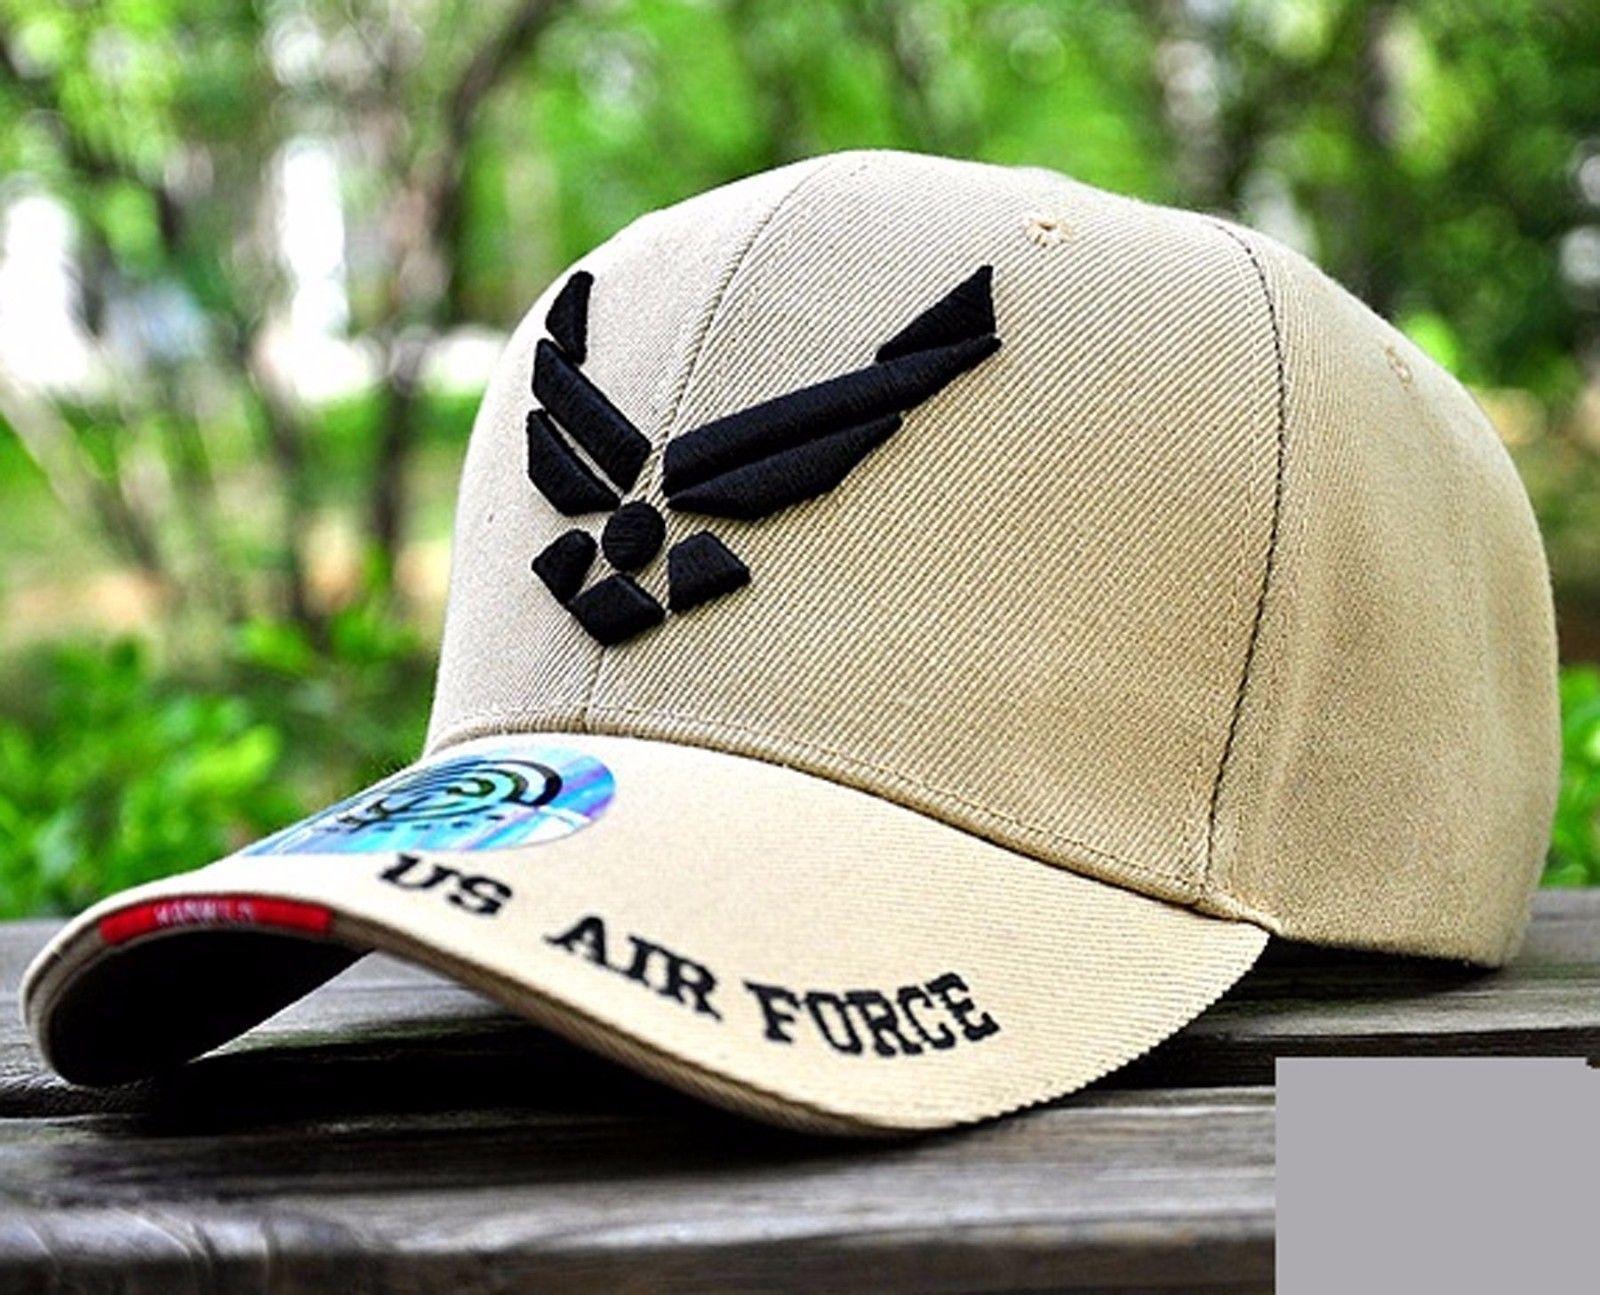 American Us Air Force Baseball Cap Hat Tactic Golf Cap Military Snapback Hat 6e66380bbb04